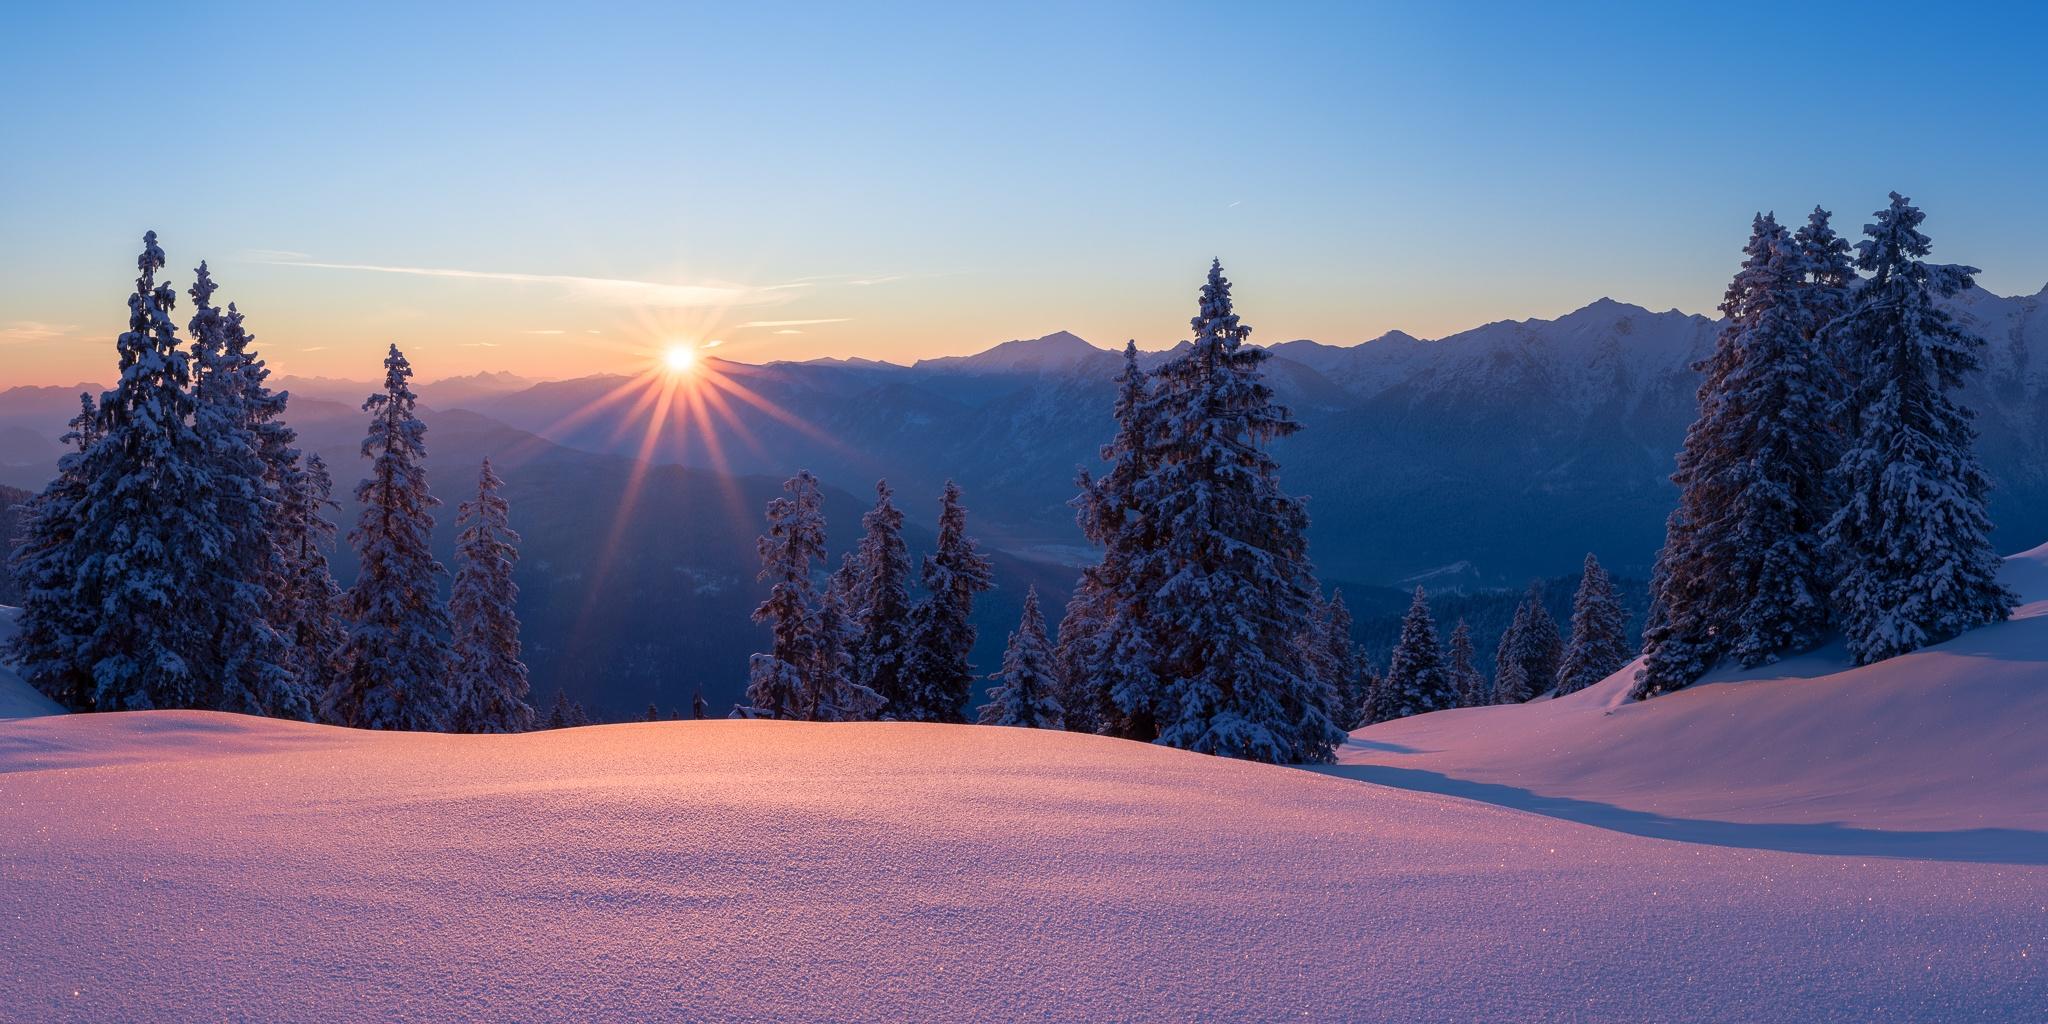 Sonnenaufgang, Winter, Schnee, Berge